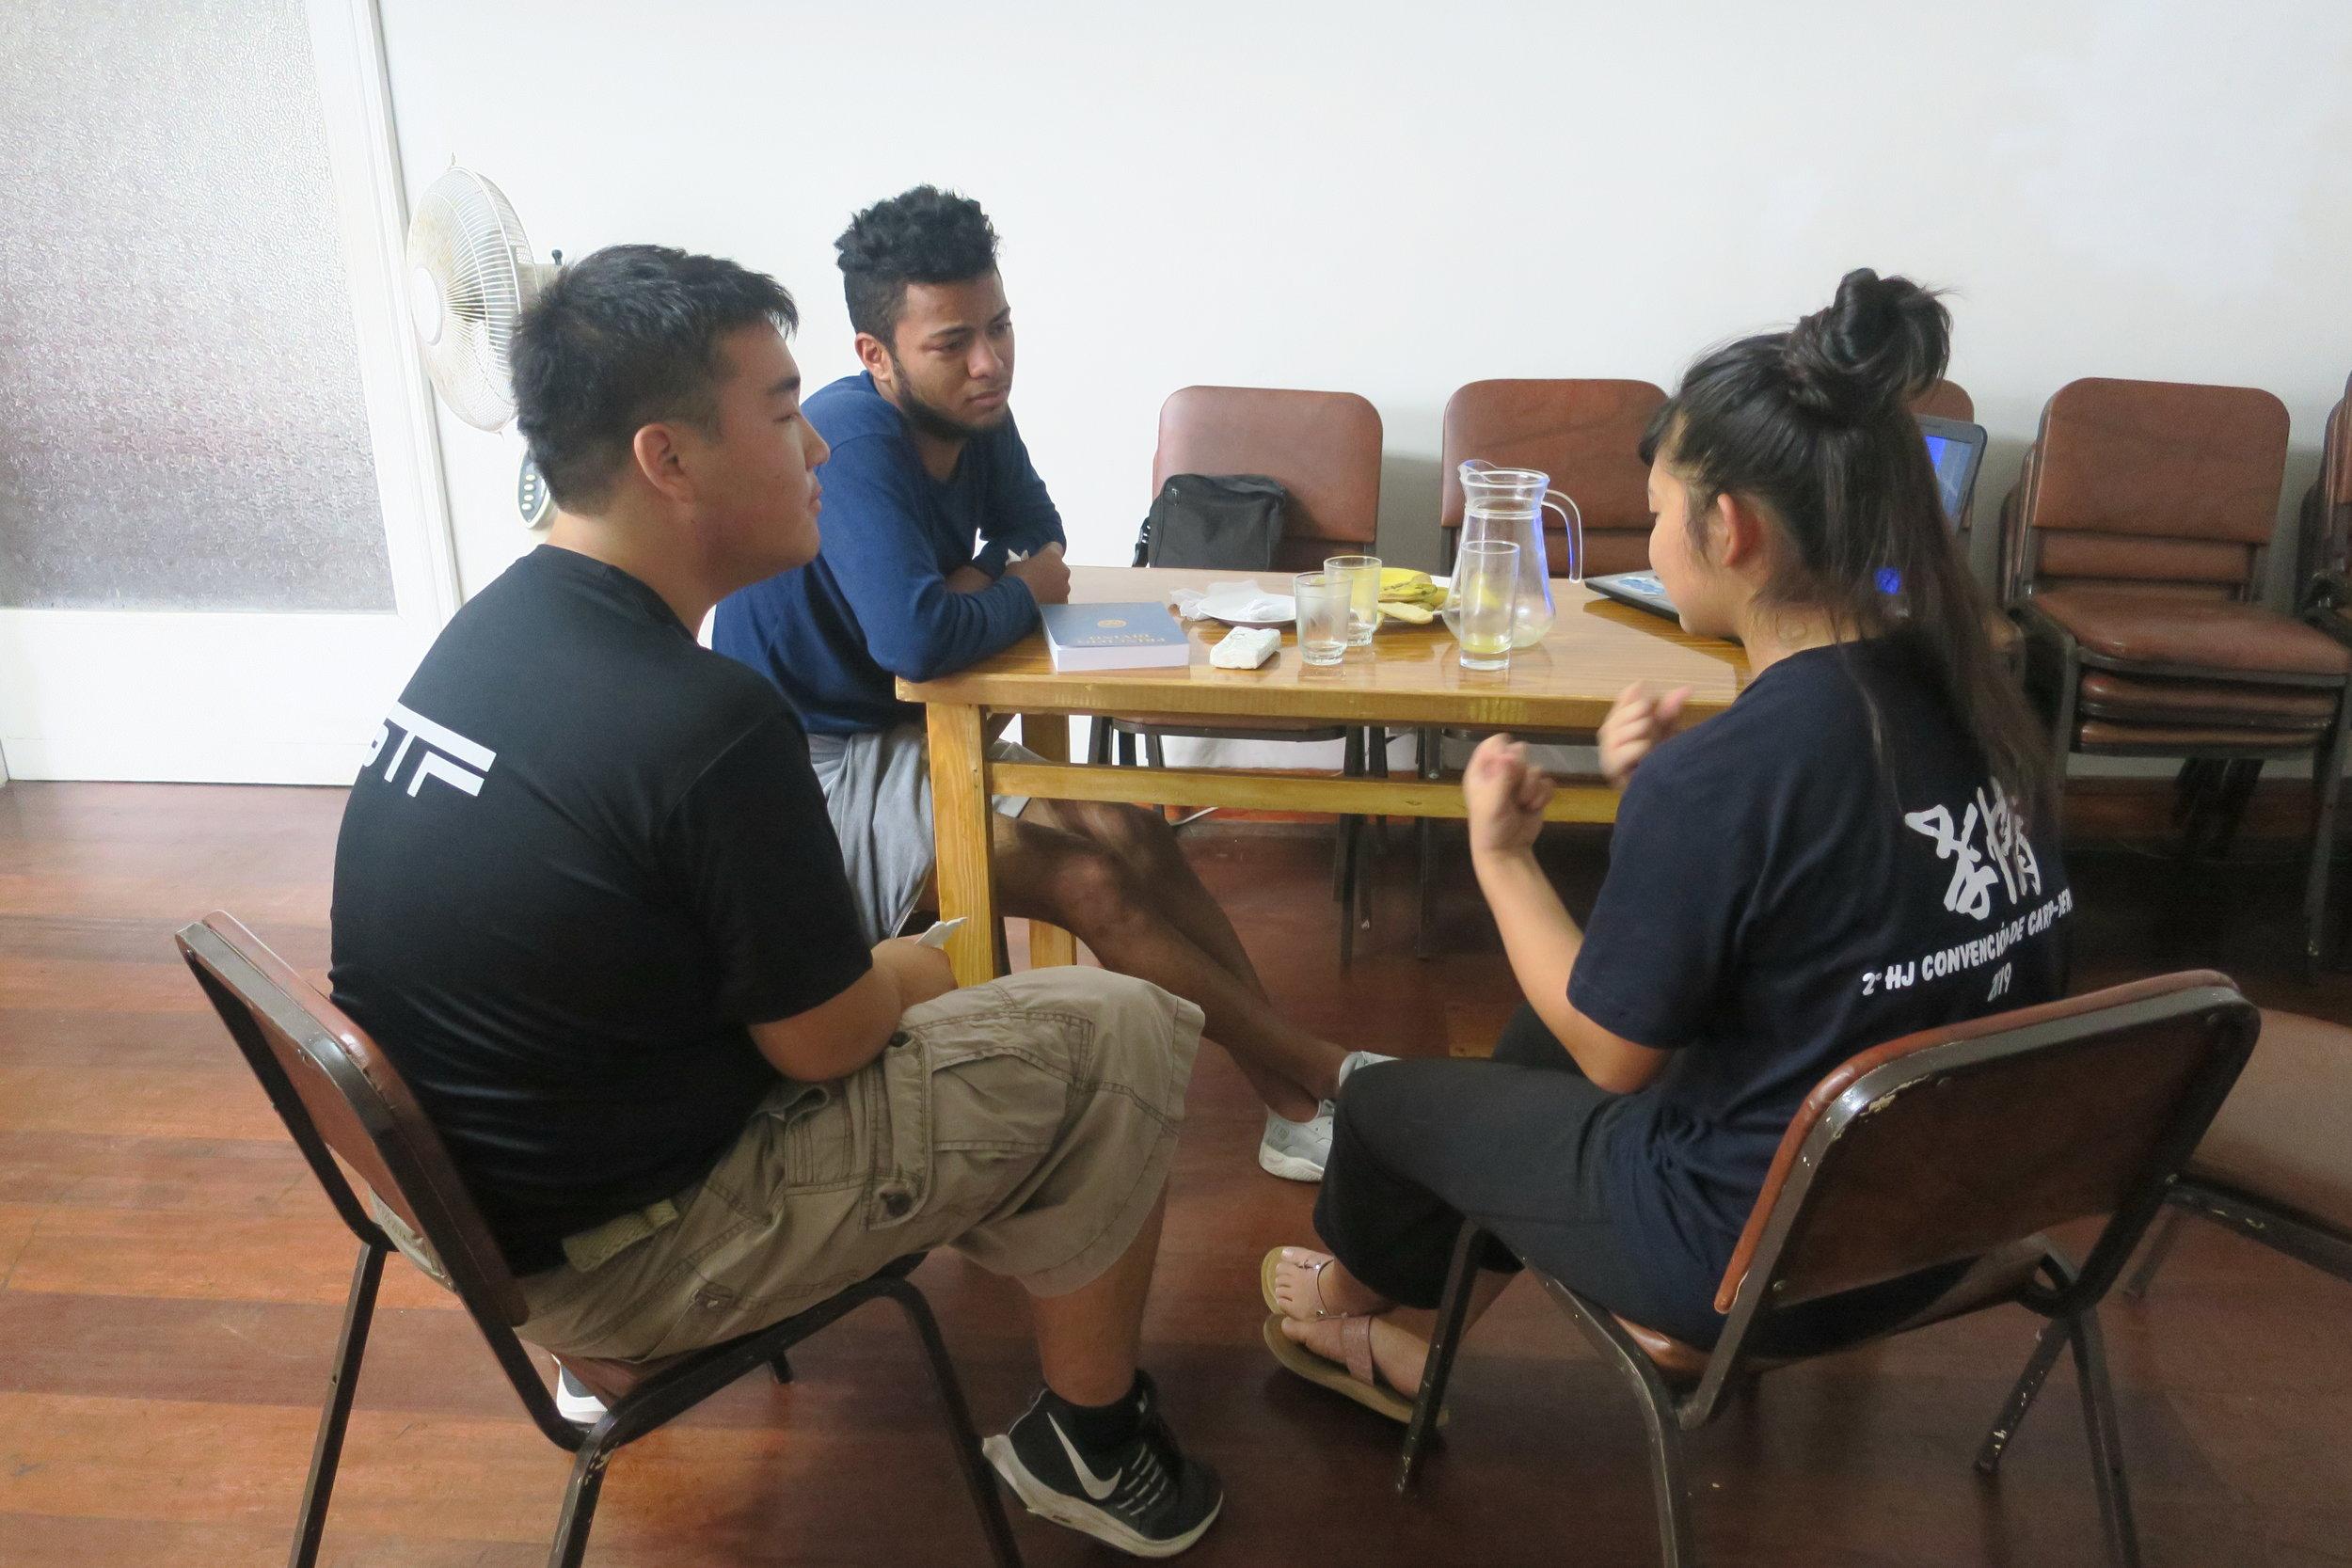 Kana Ishii and Sotetsu Honda sharing about CARP to Christofer Gonzalez.